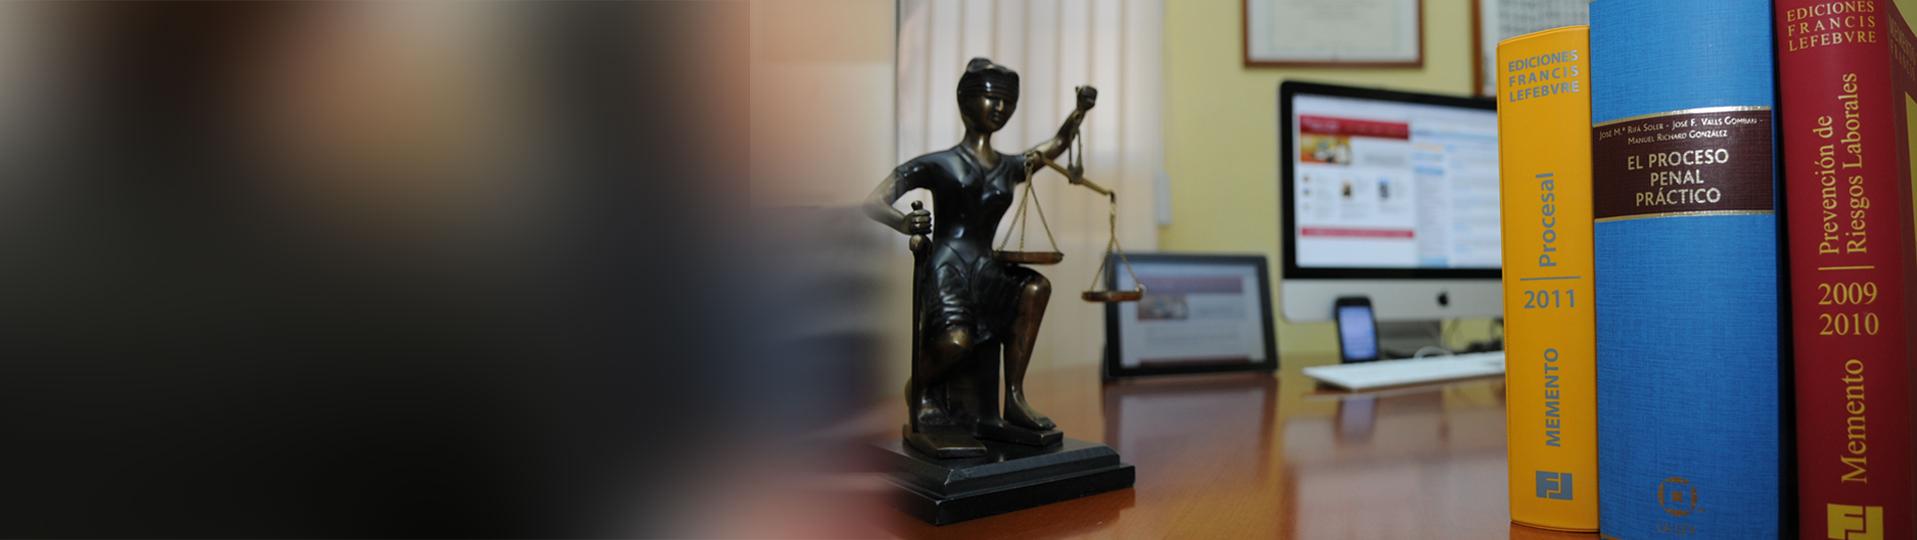 Despacho de abogados en Parla - Vicente Coleto